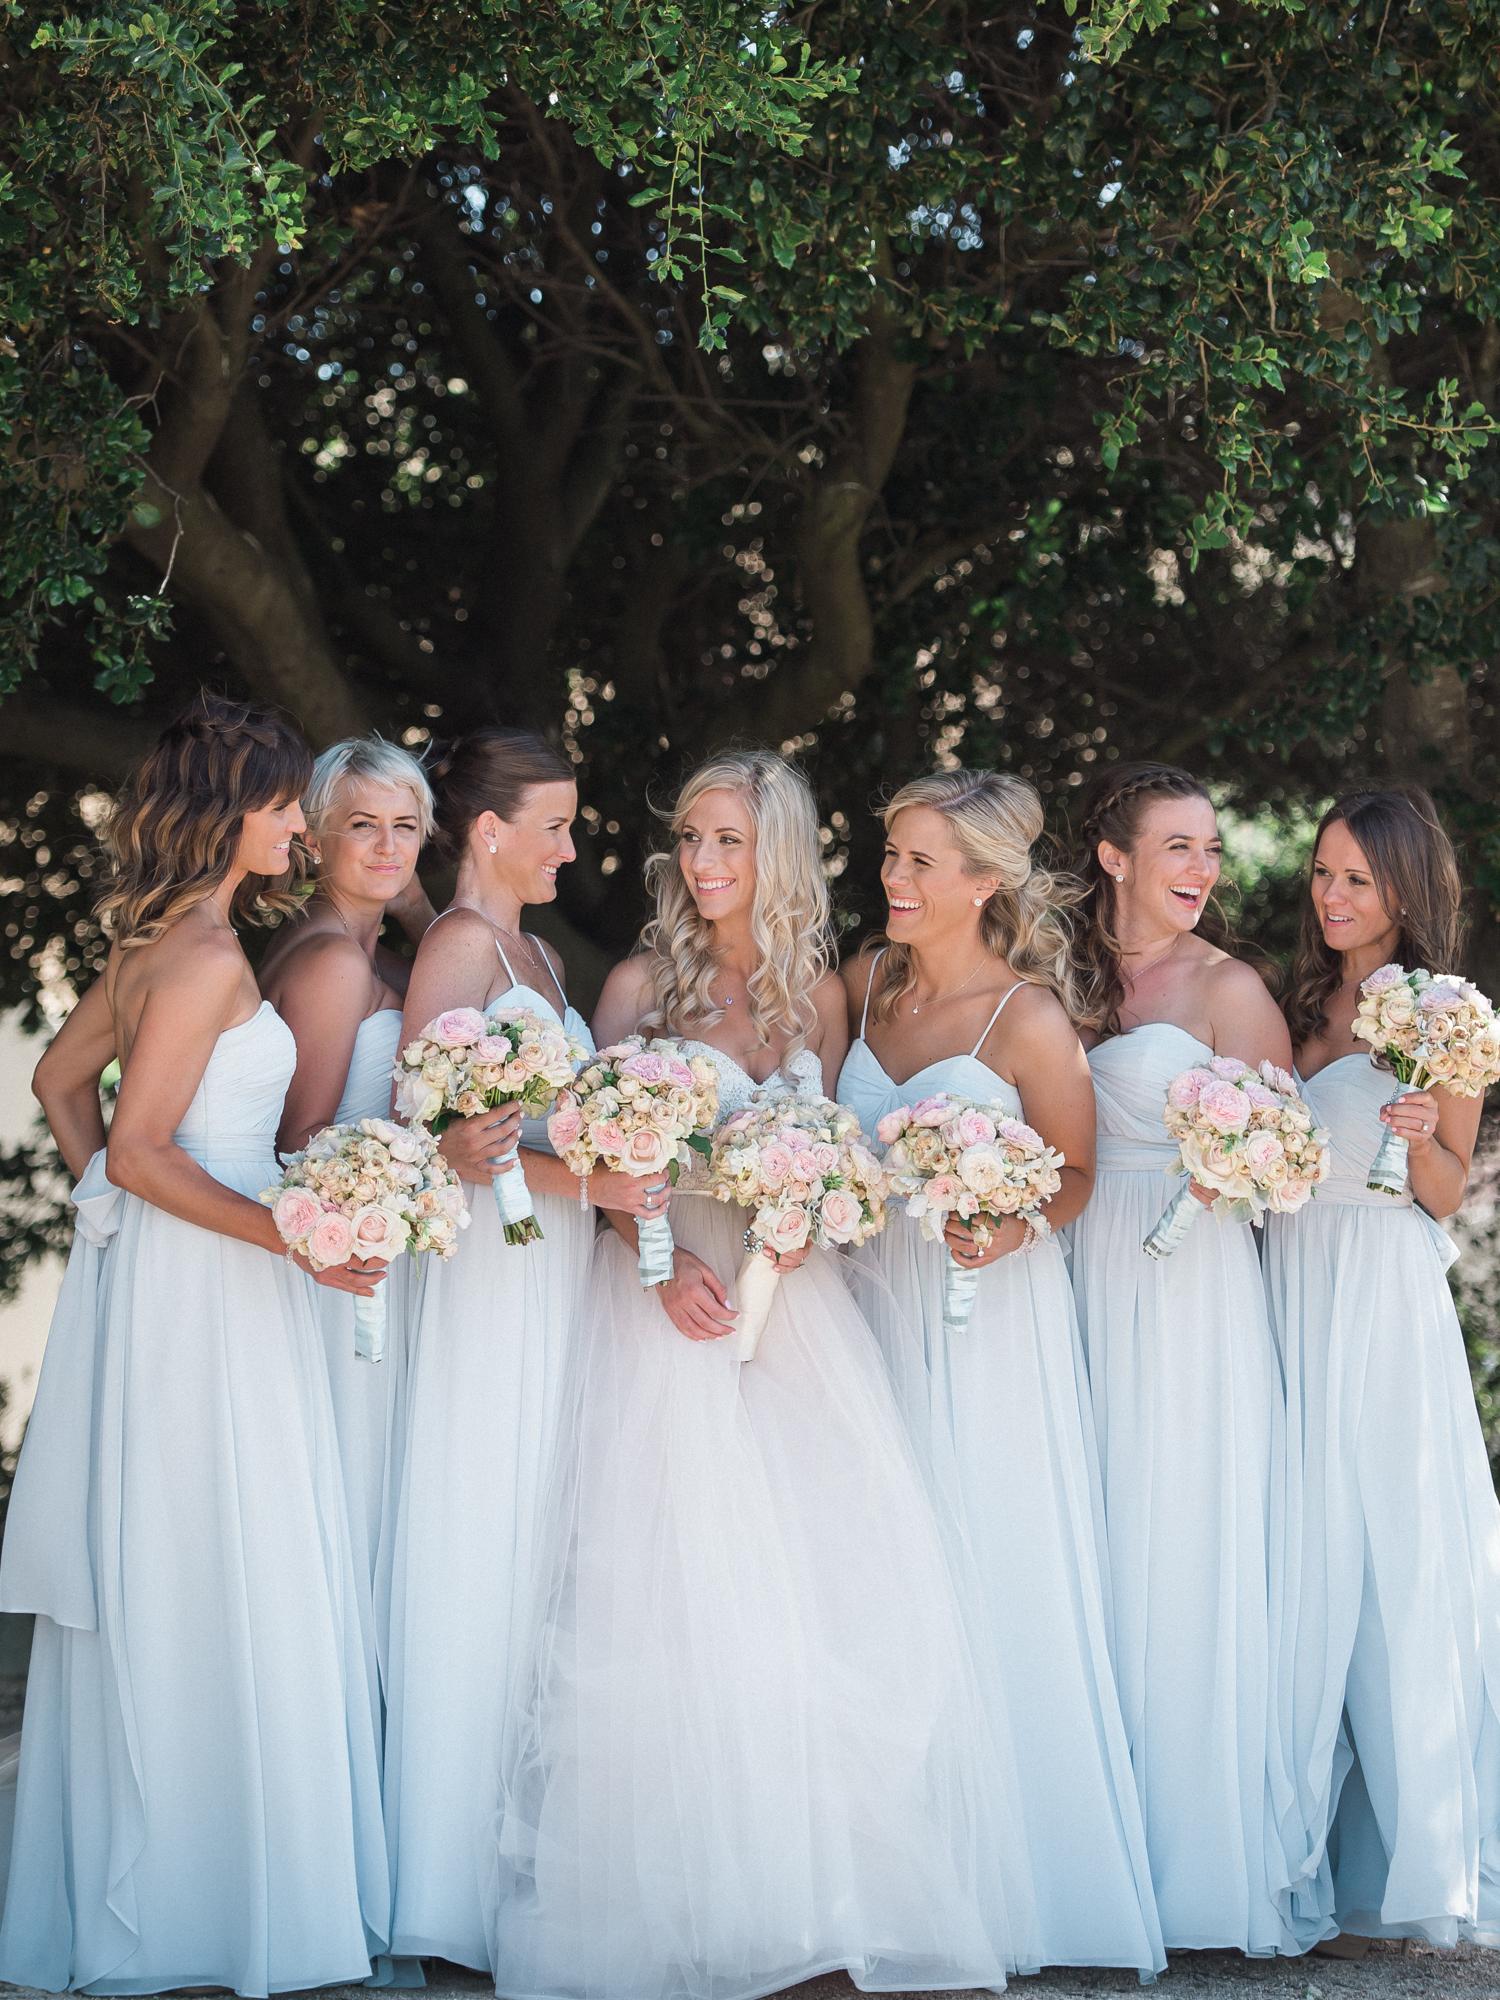 Aimee+Logan_wedding_spp-149.jpg